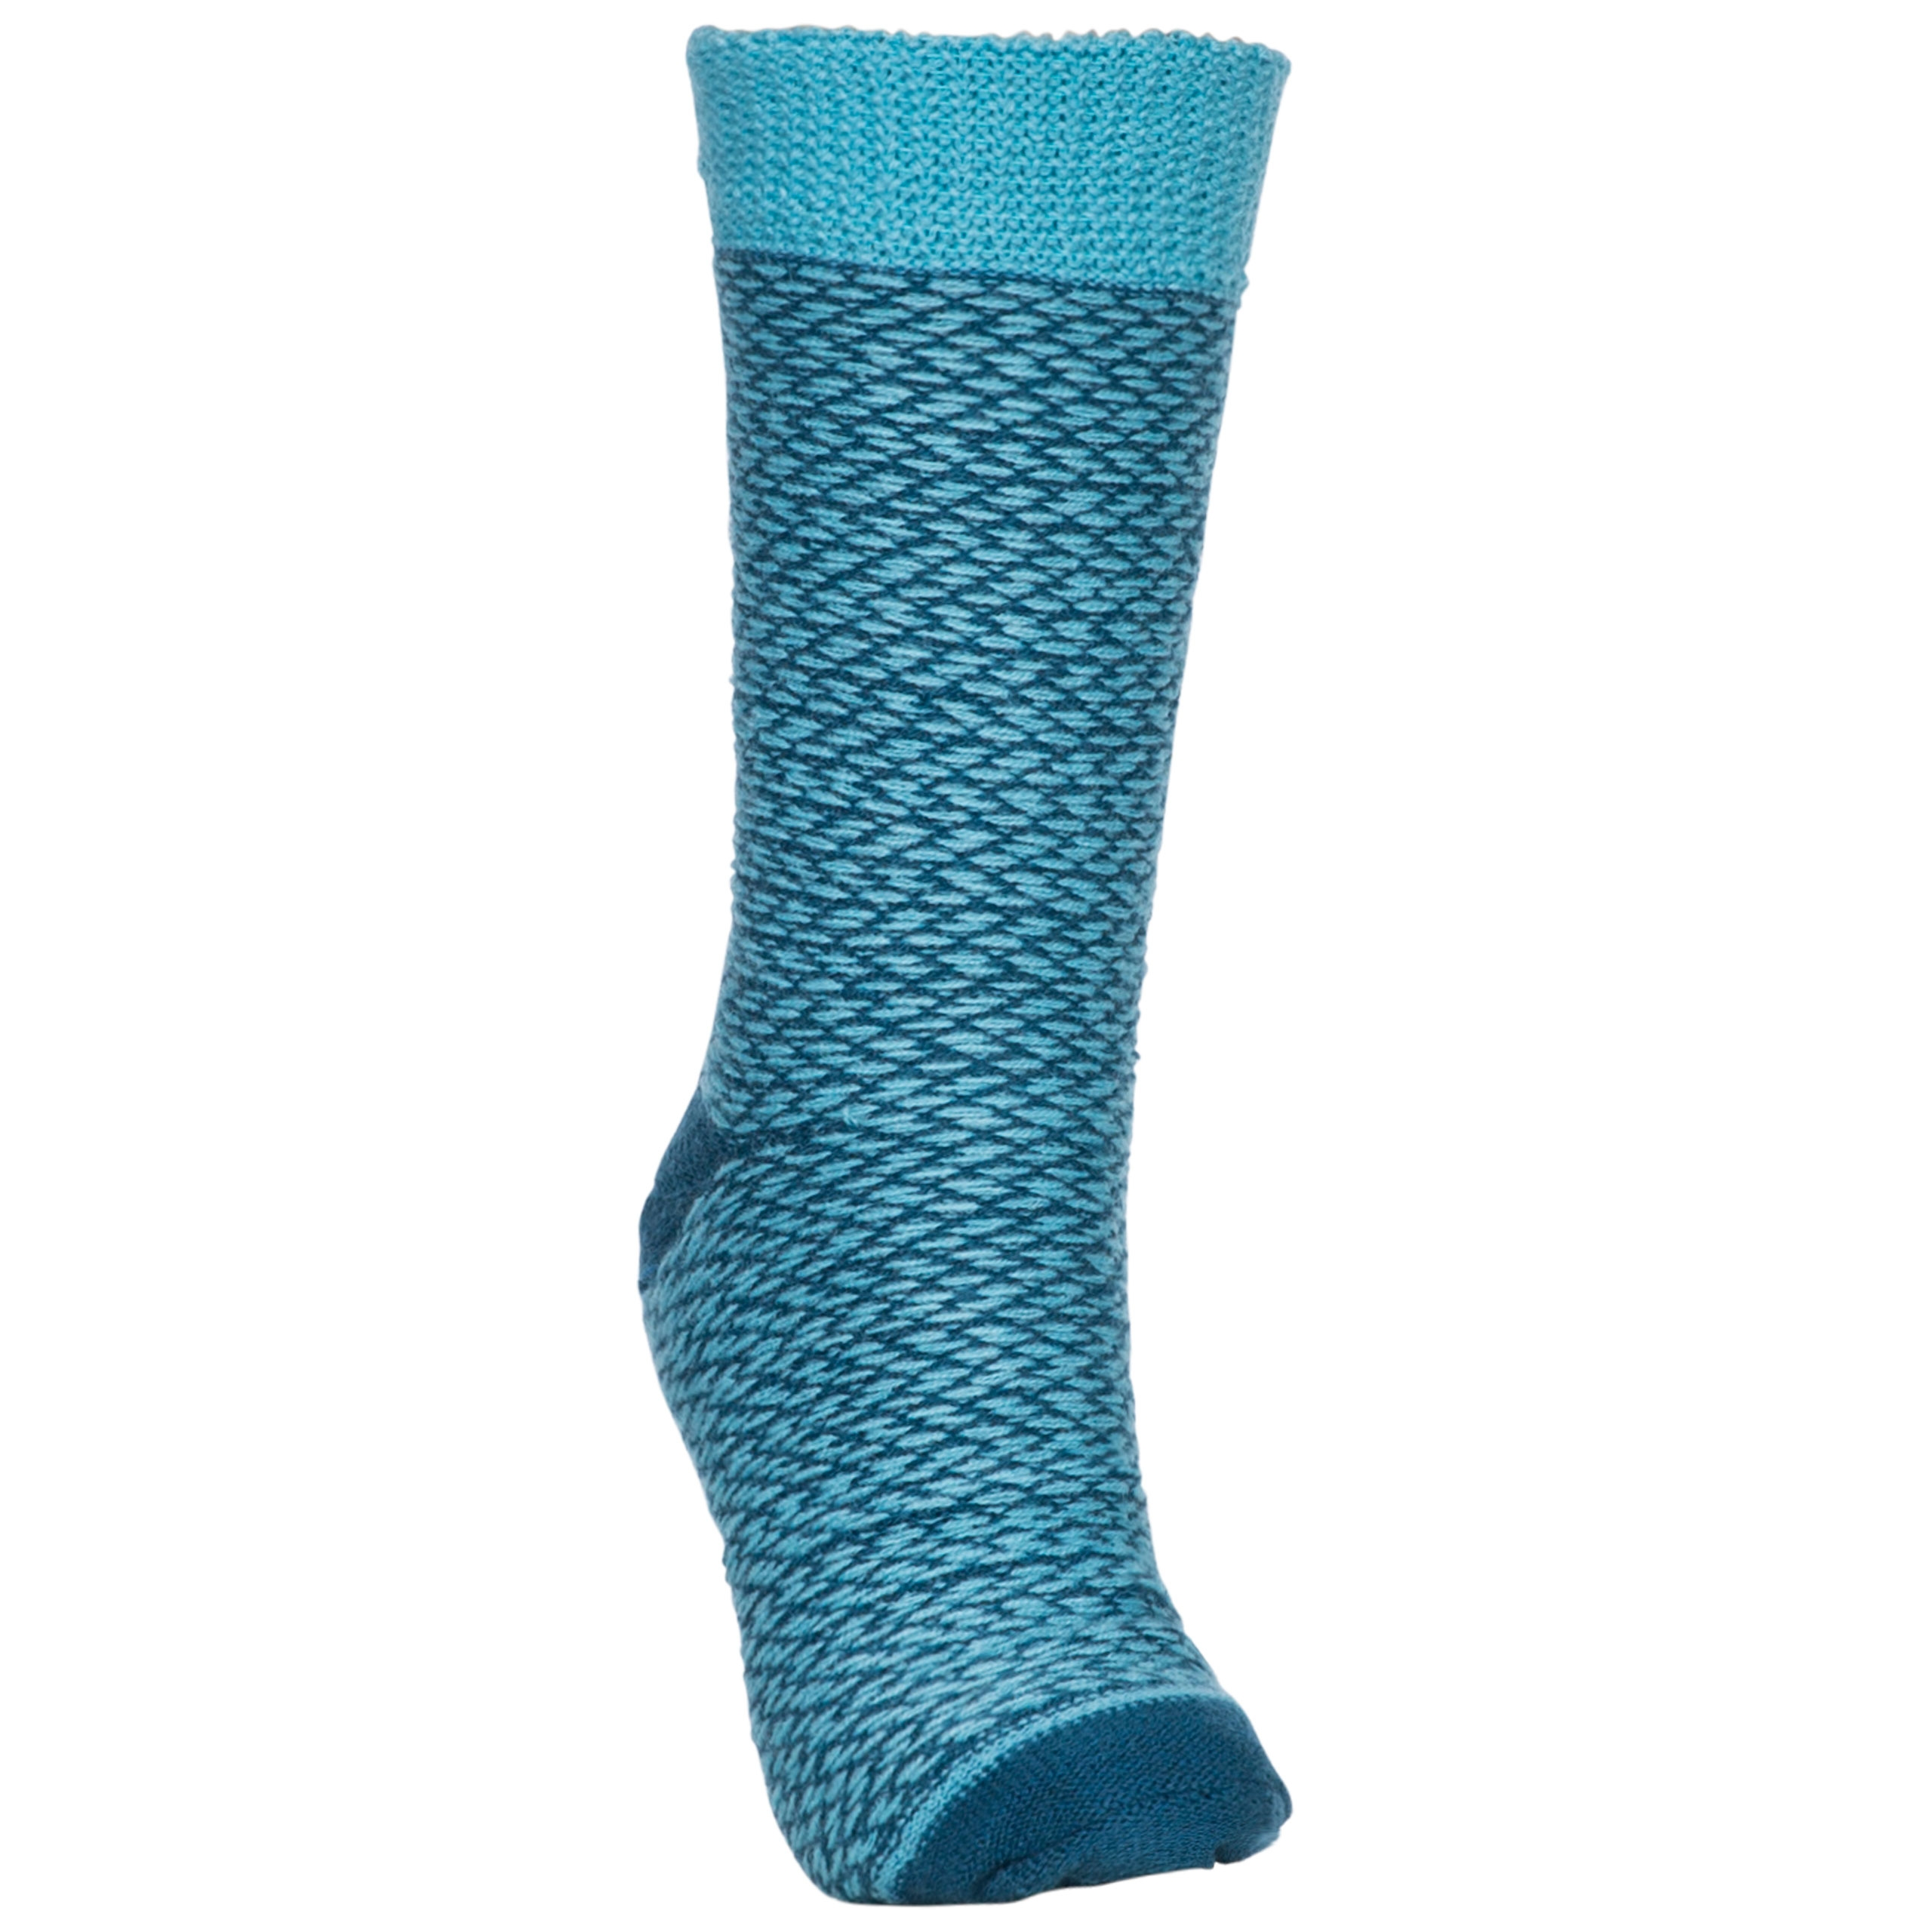 3 x Ladies Women Thermal Winter Warm Trainer Socks